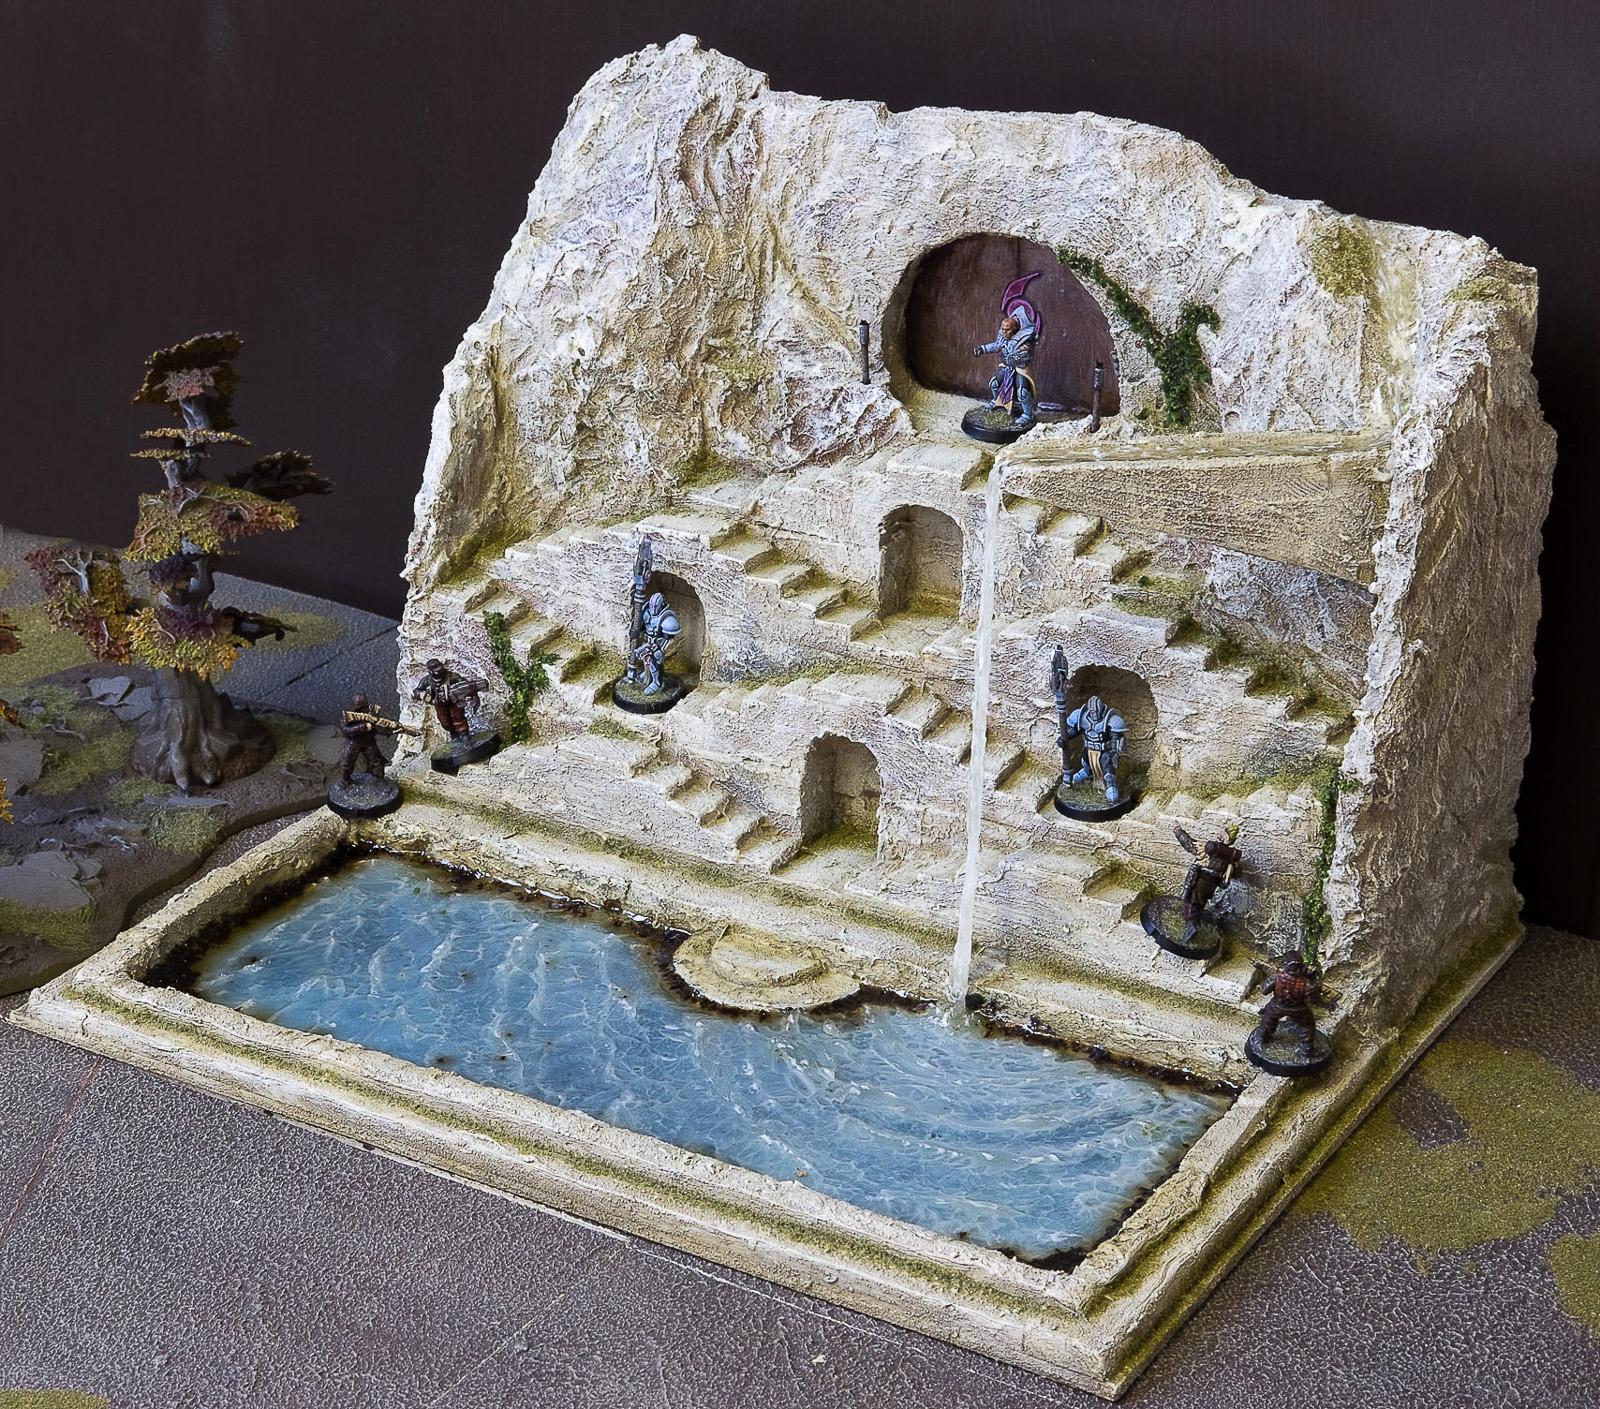 Broken, Buildings, Karis, Maelstrom's Edge, Praetorians, Temple, Terrain